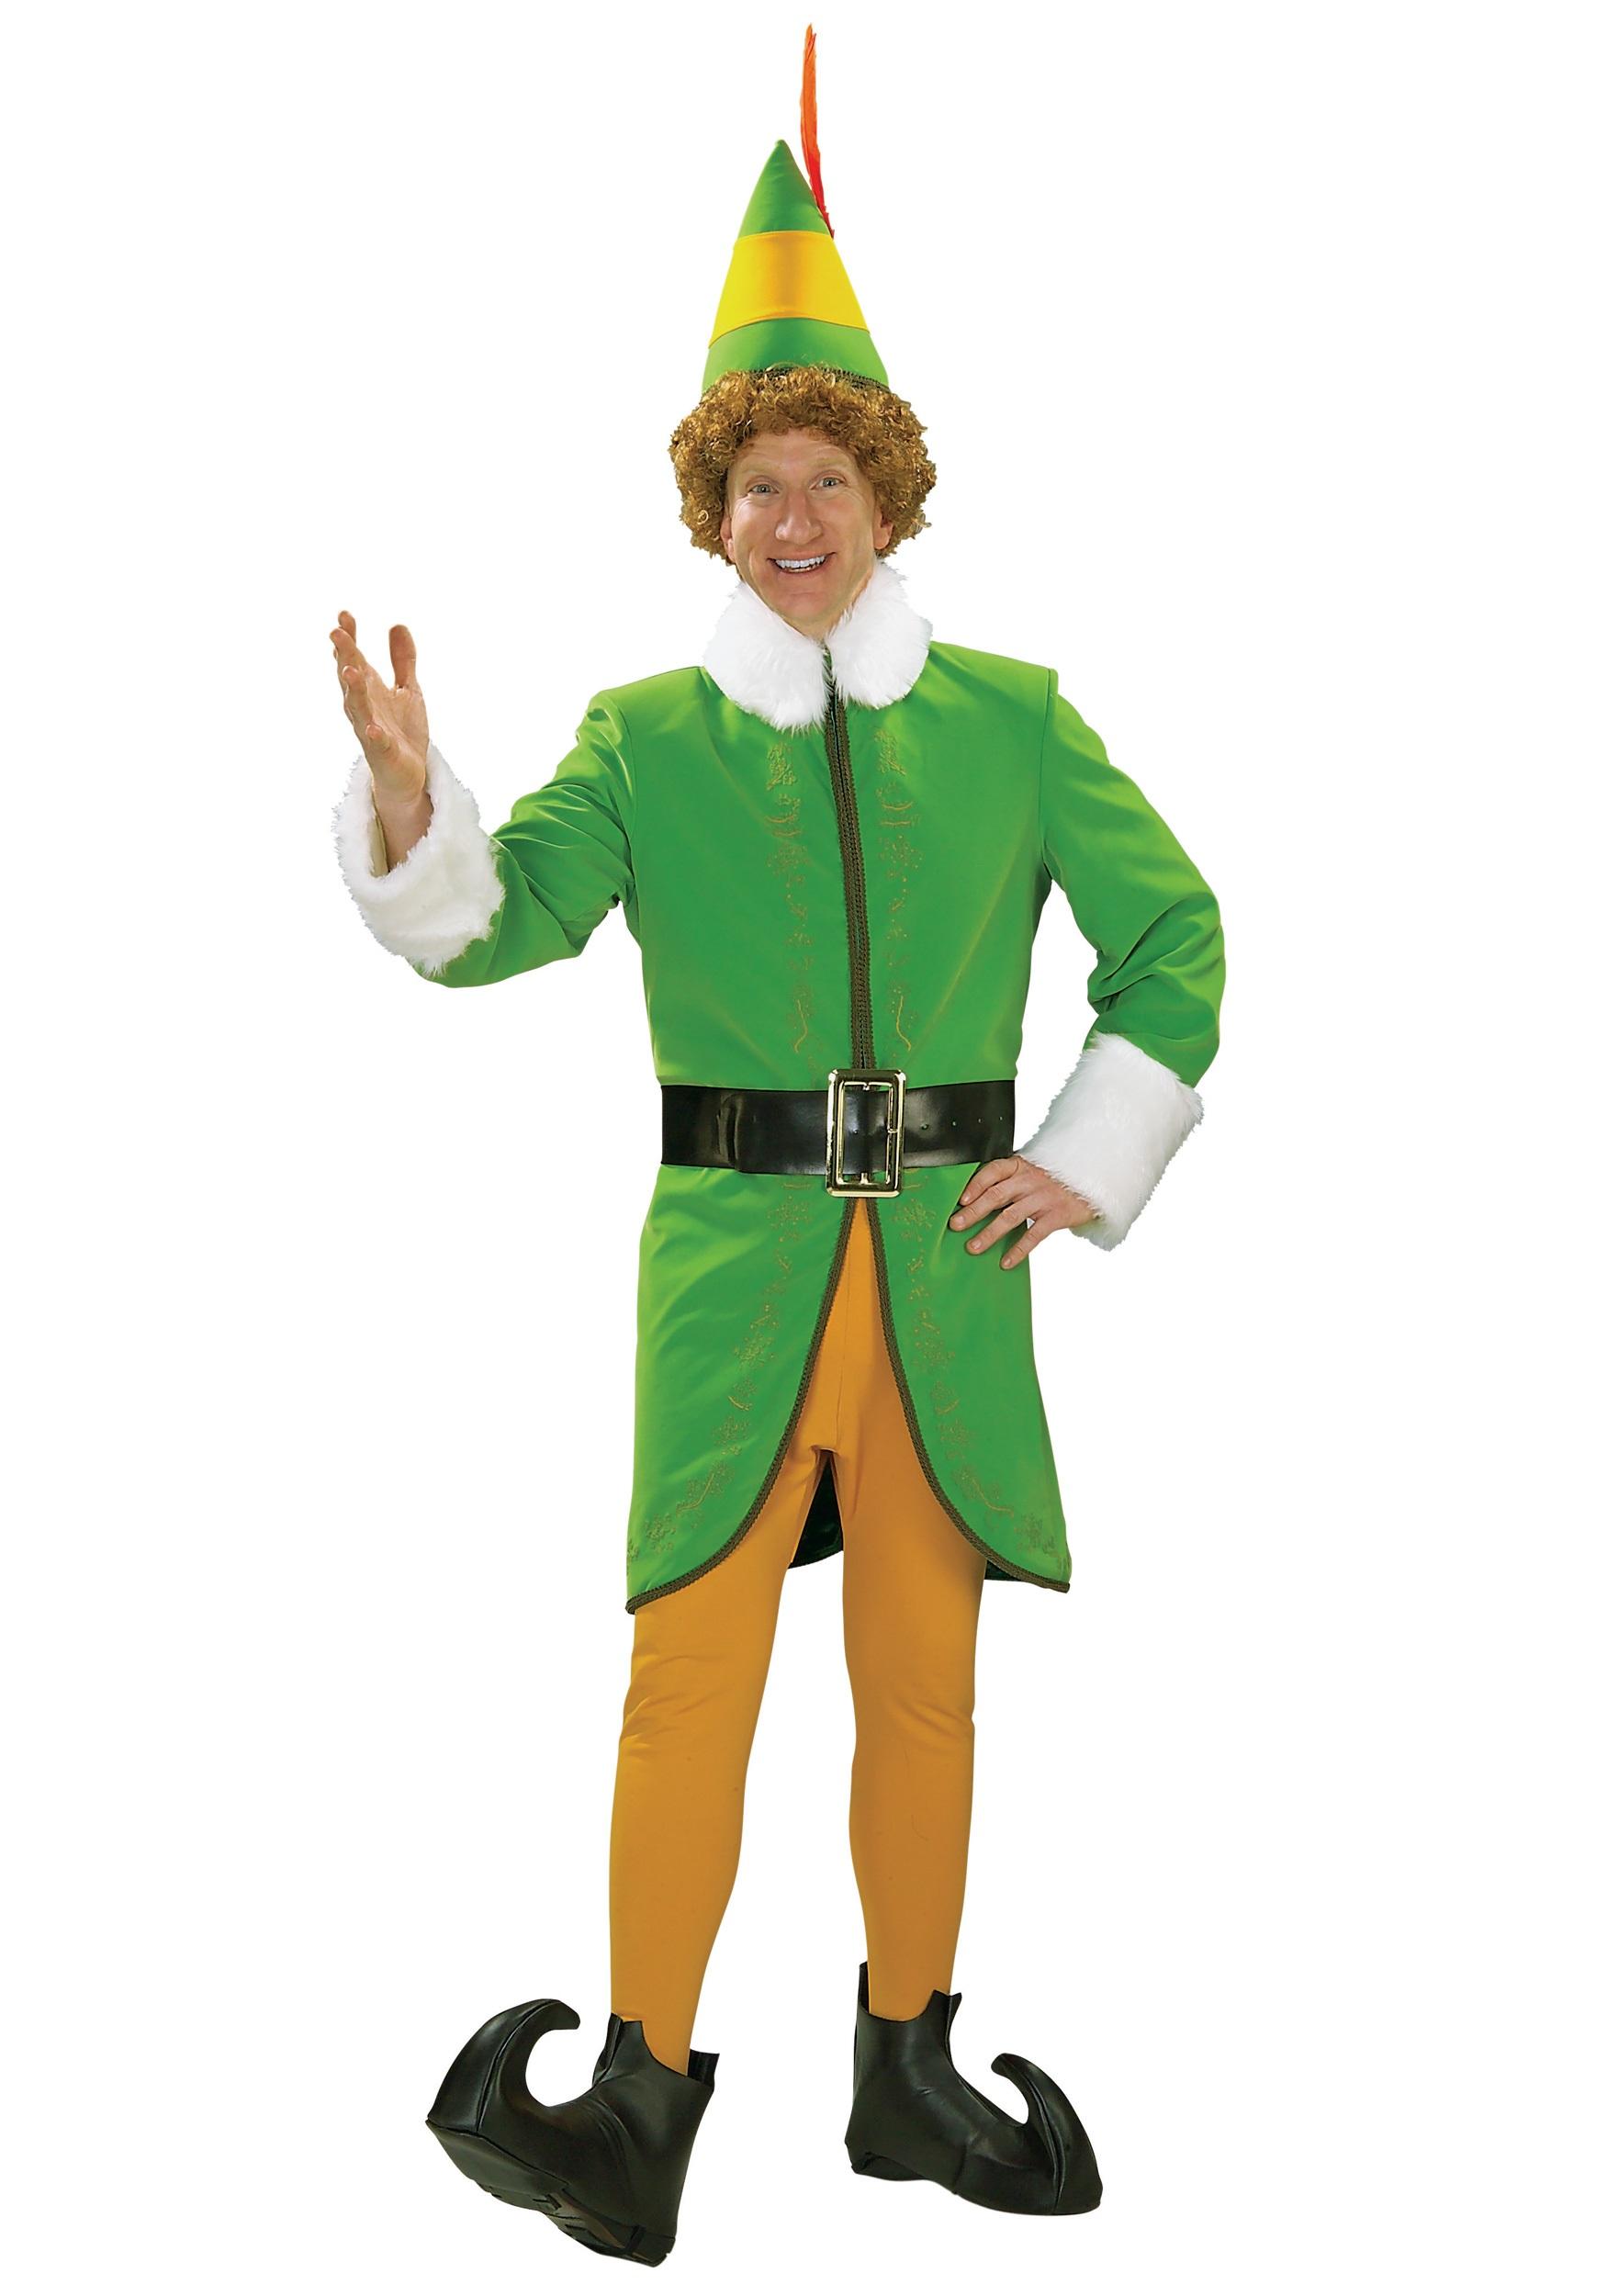 Deluxe Buddy the Elf Costume  sc 1 st  Halloween Costumes & Deluxe Buddy the Elf Costume - Halloween Costumes